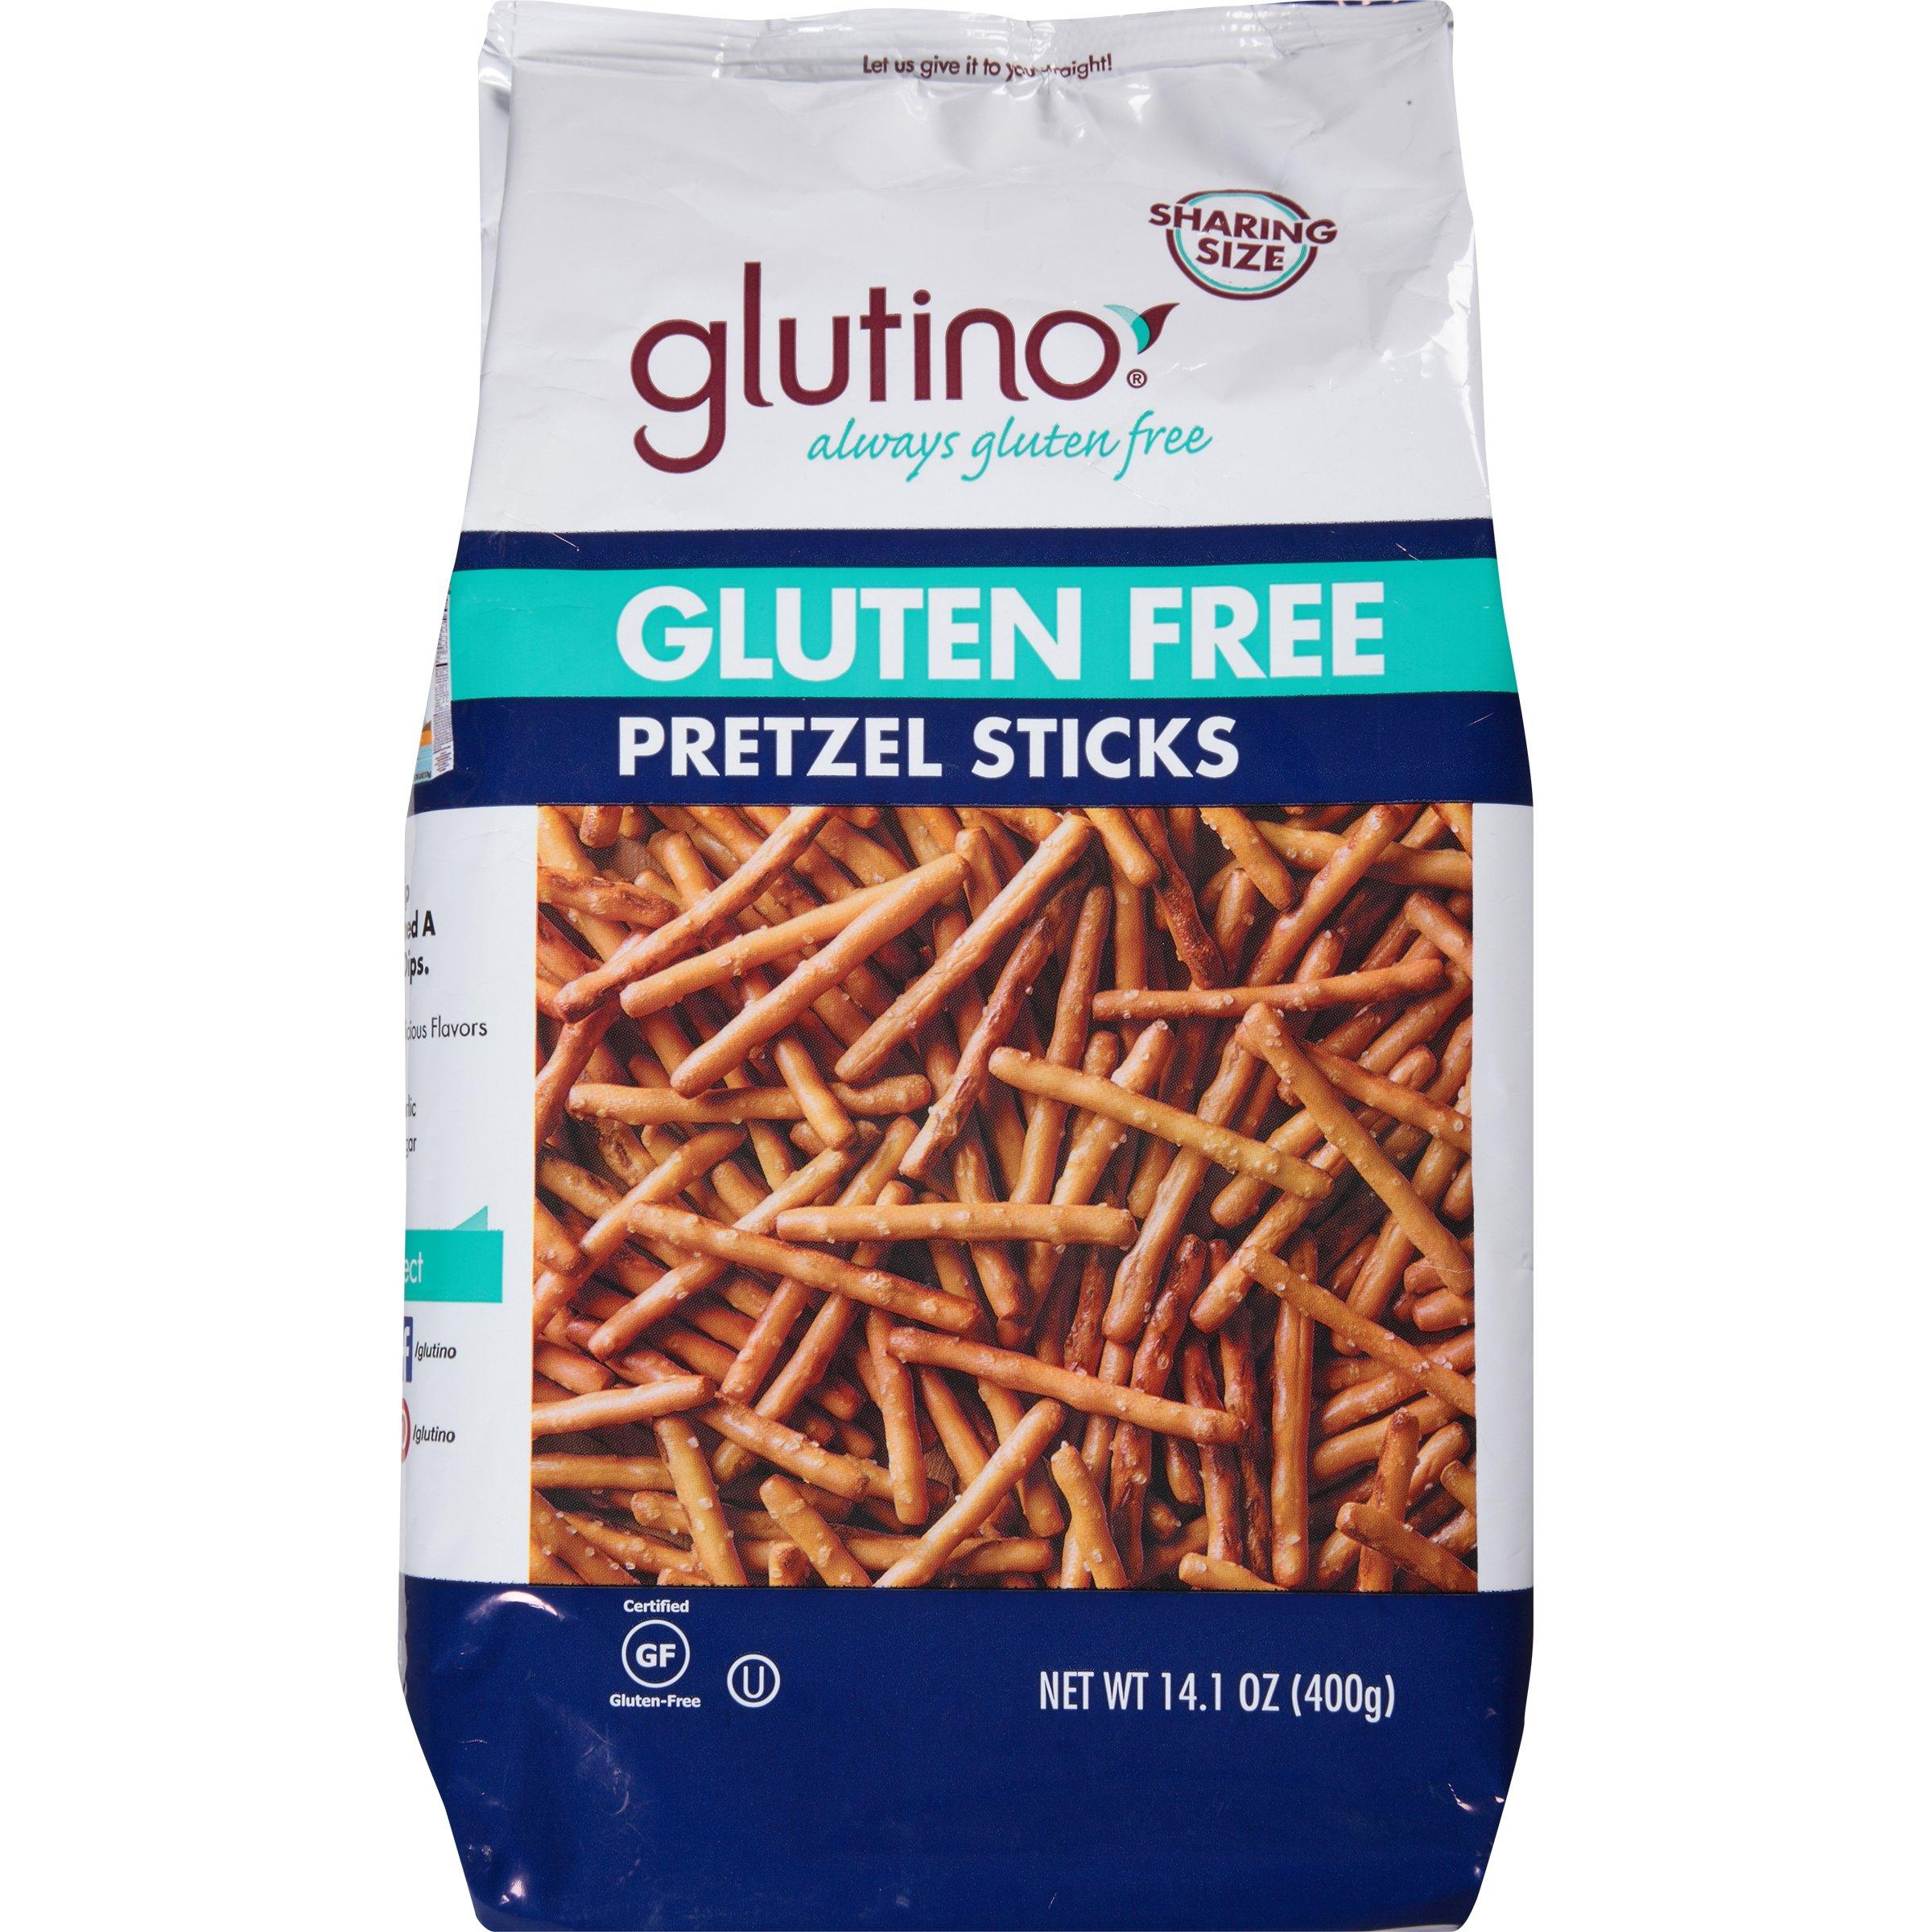 Glutino Gluten Free Pretzel Sticks, 14.1 Ounce